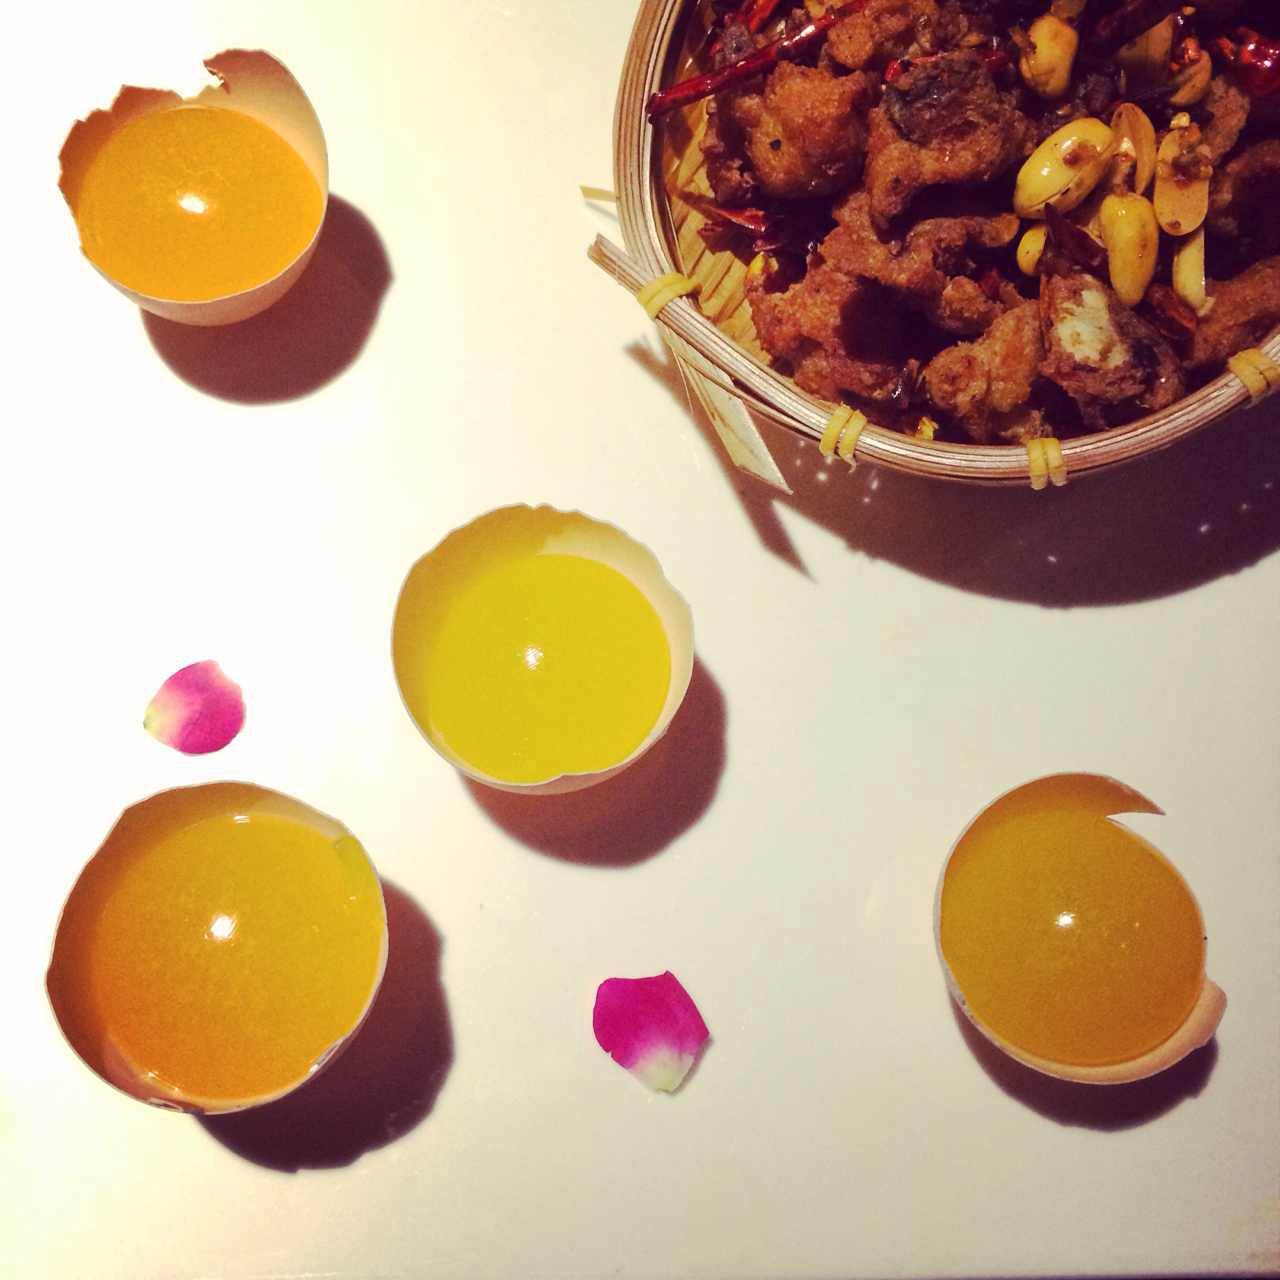 夏の门:将人生的愉悦感托付给味蕾